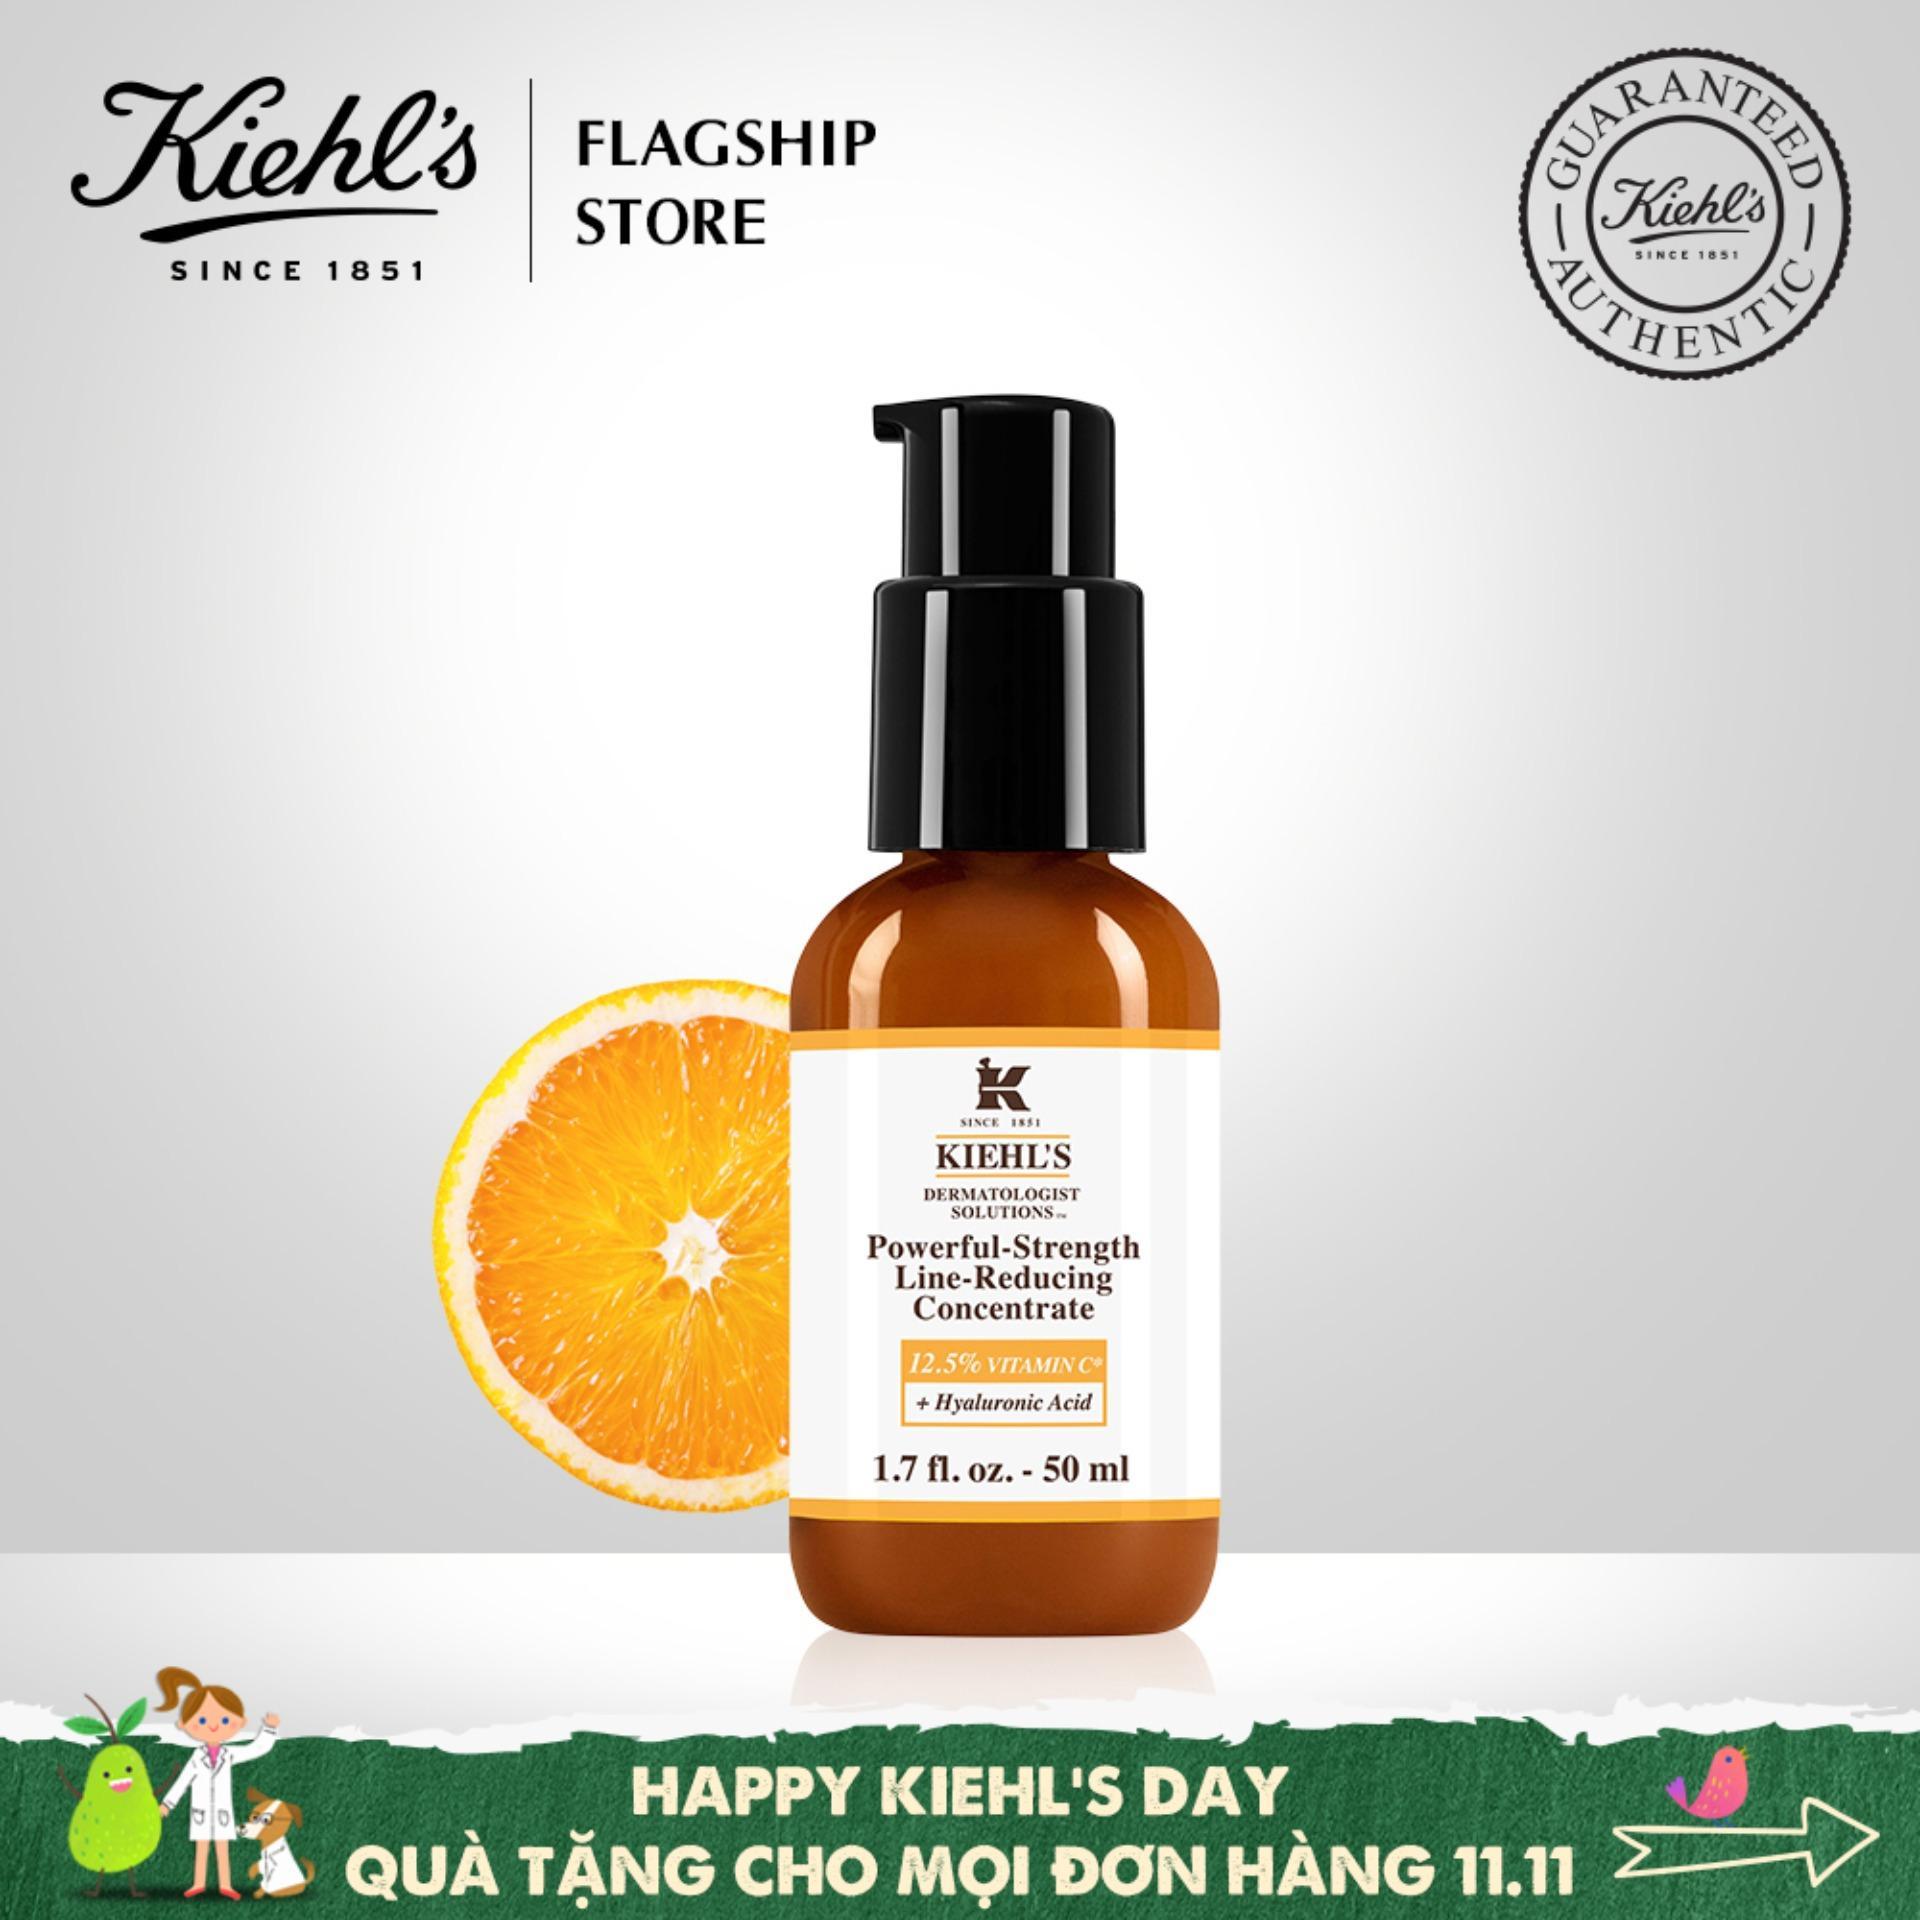 Serum Vitamin C Cải Tiến Kiehls Powerful-Strength Line-Reducing Concentrate 50ML nhập khẩu